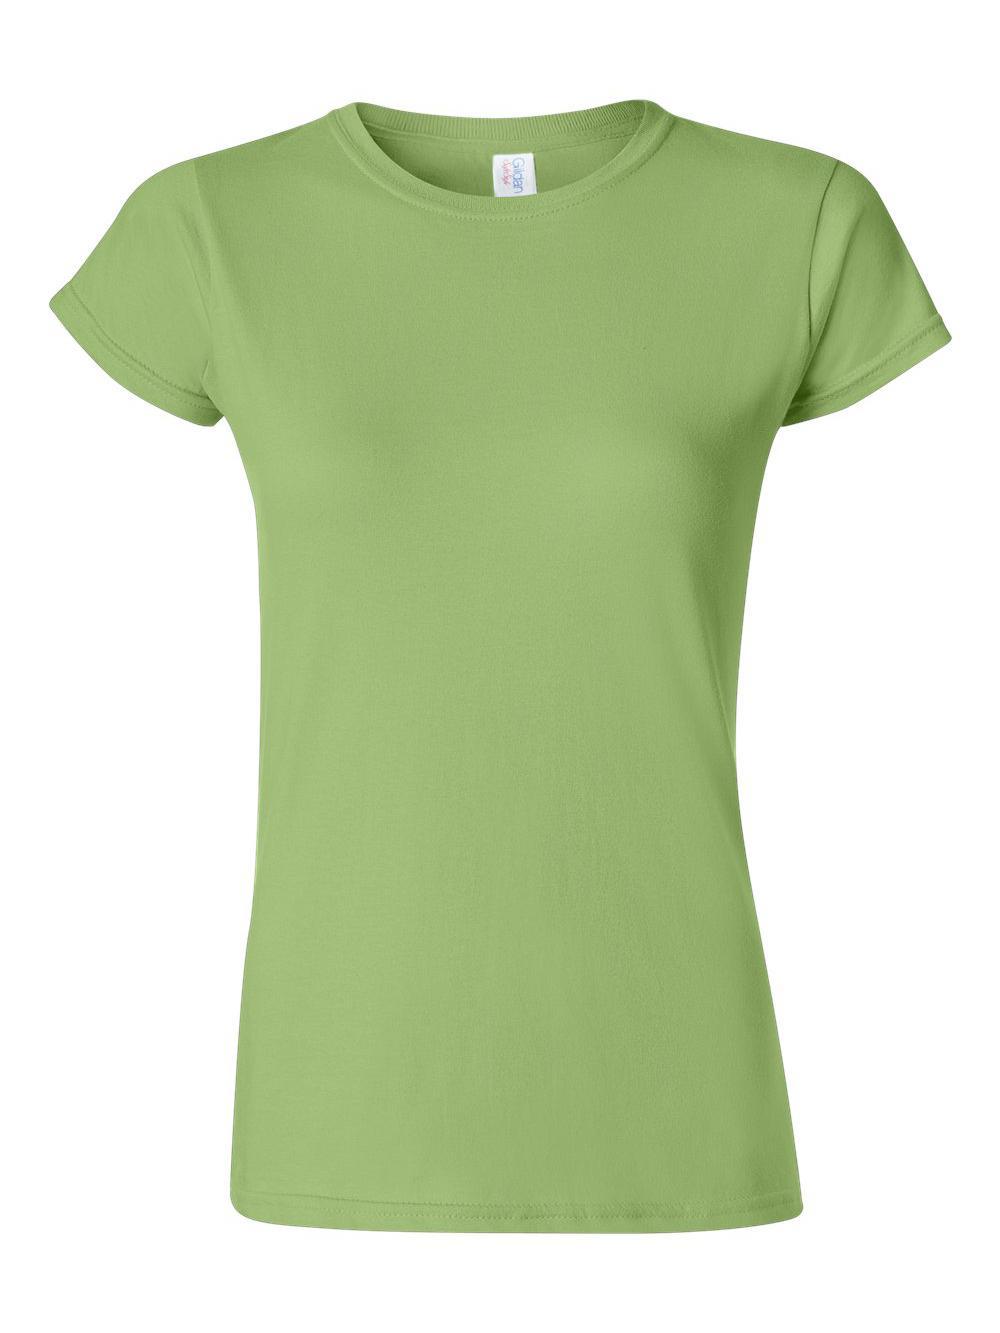 Gildan-Softstyle-Women-039-s-T-Shirt-64000L thumbnail 30